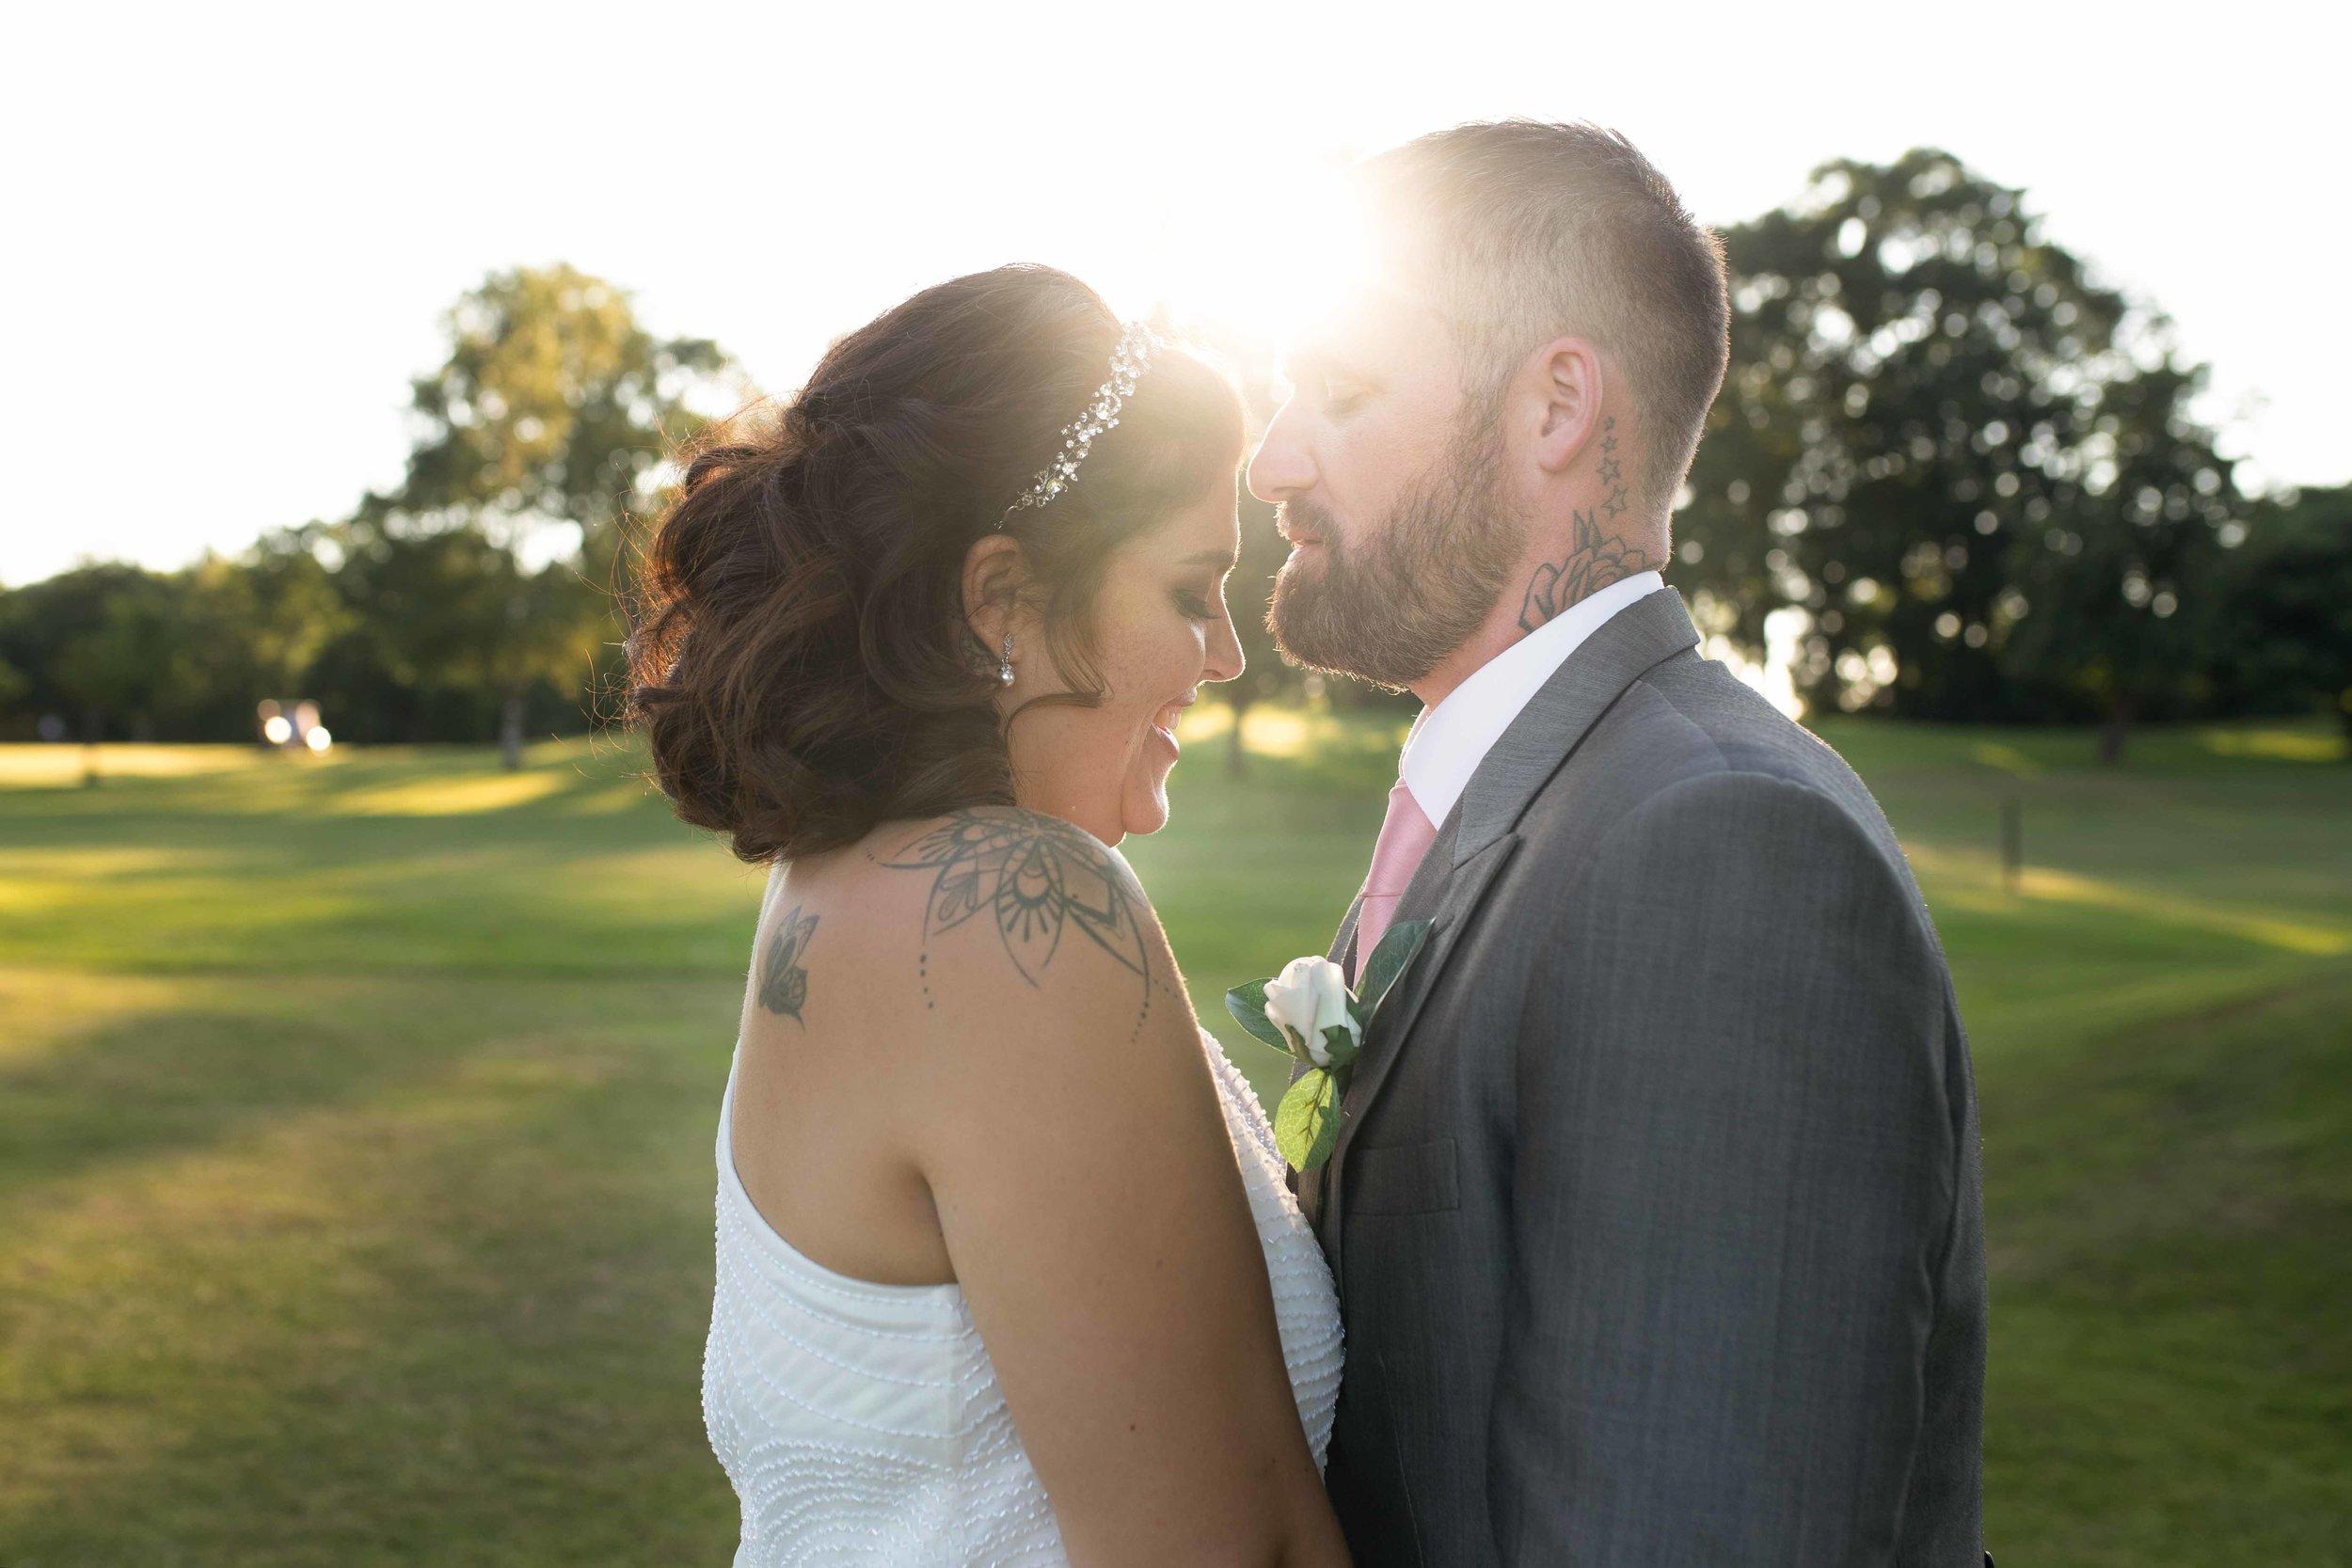 Lea-cooper-photography-wedding-photography-wolverhampton-patshull-park-hotel-wedding-pattingham-wolverhampton-west-midlands-uk-35.JPG